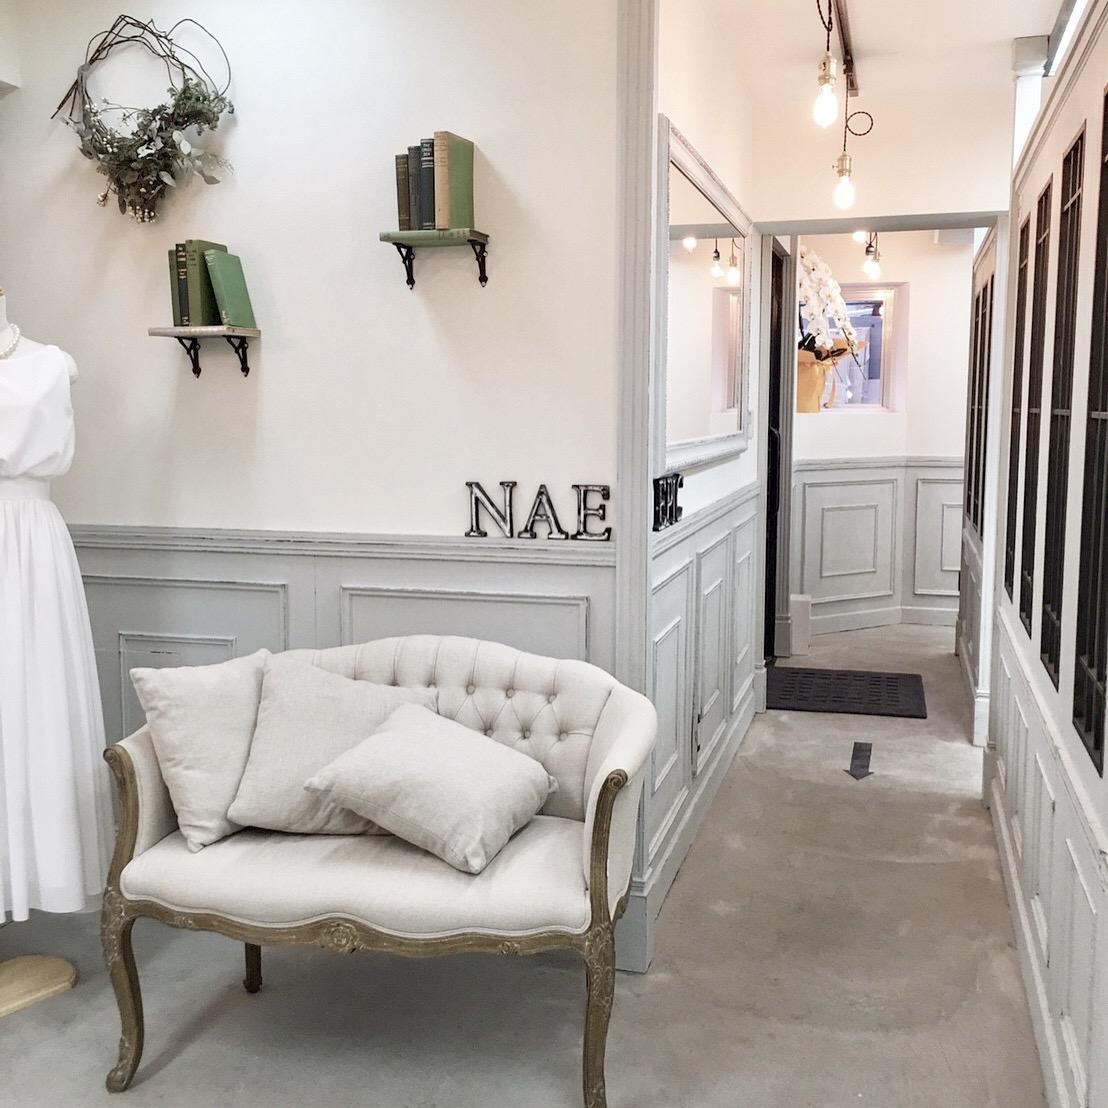 atelier nae_3